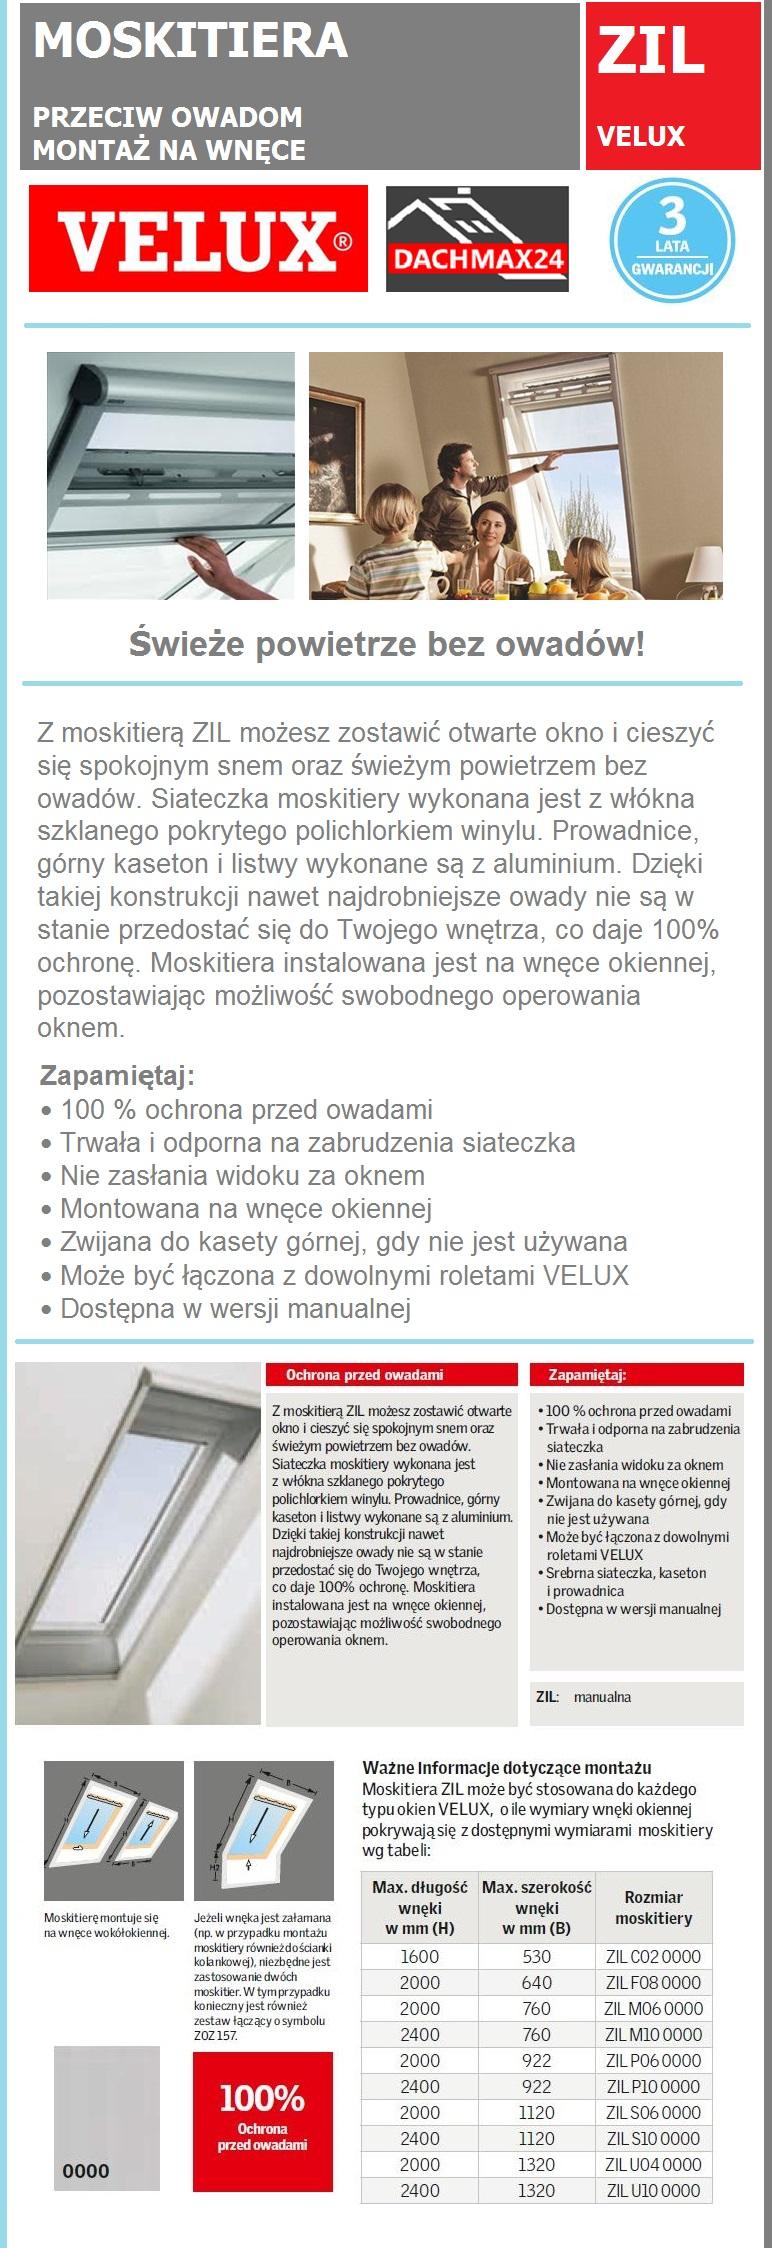 moskitiera rolowana velux zil ochrona przed owadami. Black Bedroom Furniture Sets. Home Design Ideas